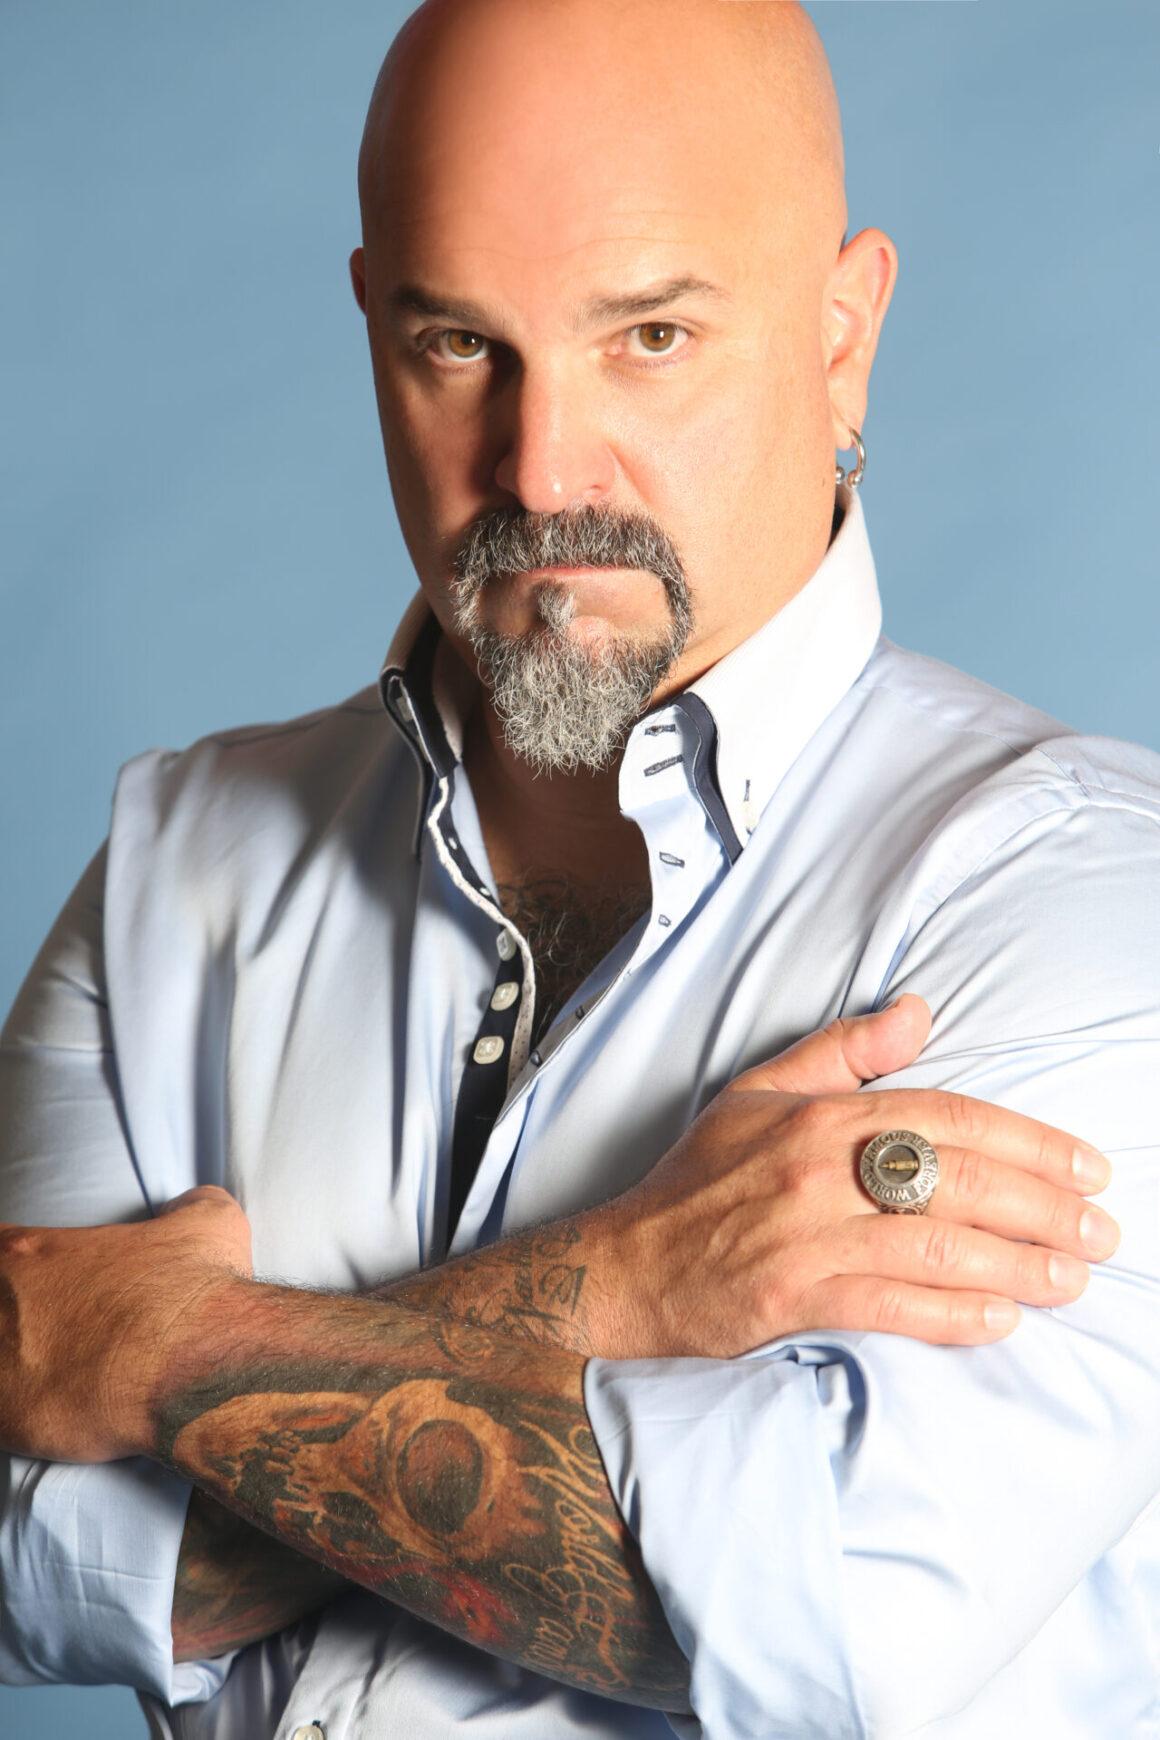 Lou Rubino, World Famous Tattoo Ink